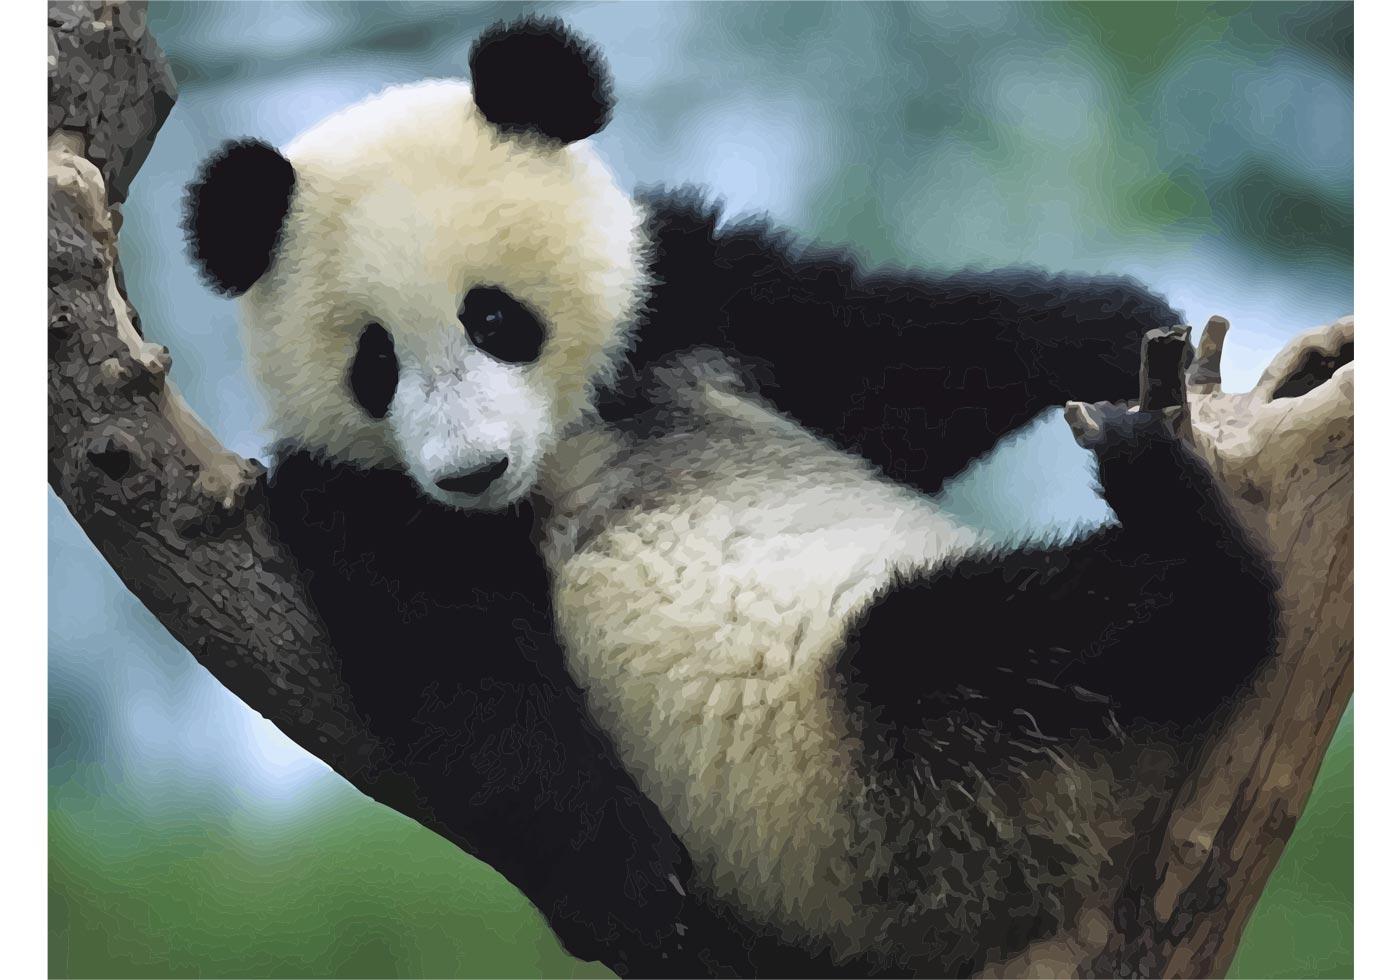 Cute Child Love Wallpaper Panda Cub Download Free Vector Art Stock Graphics Amp Images